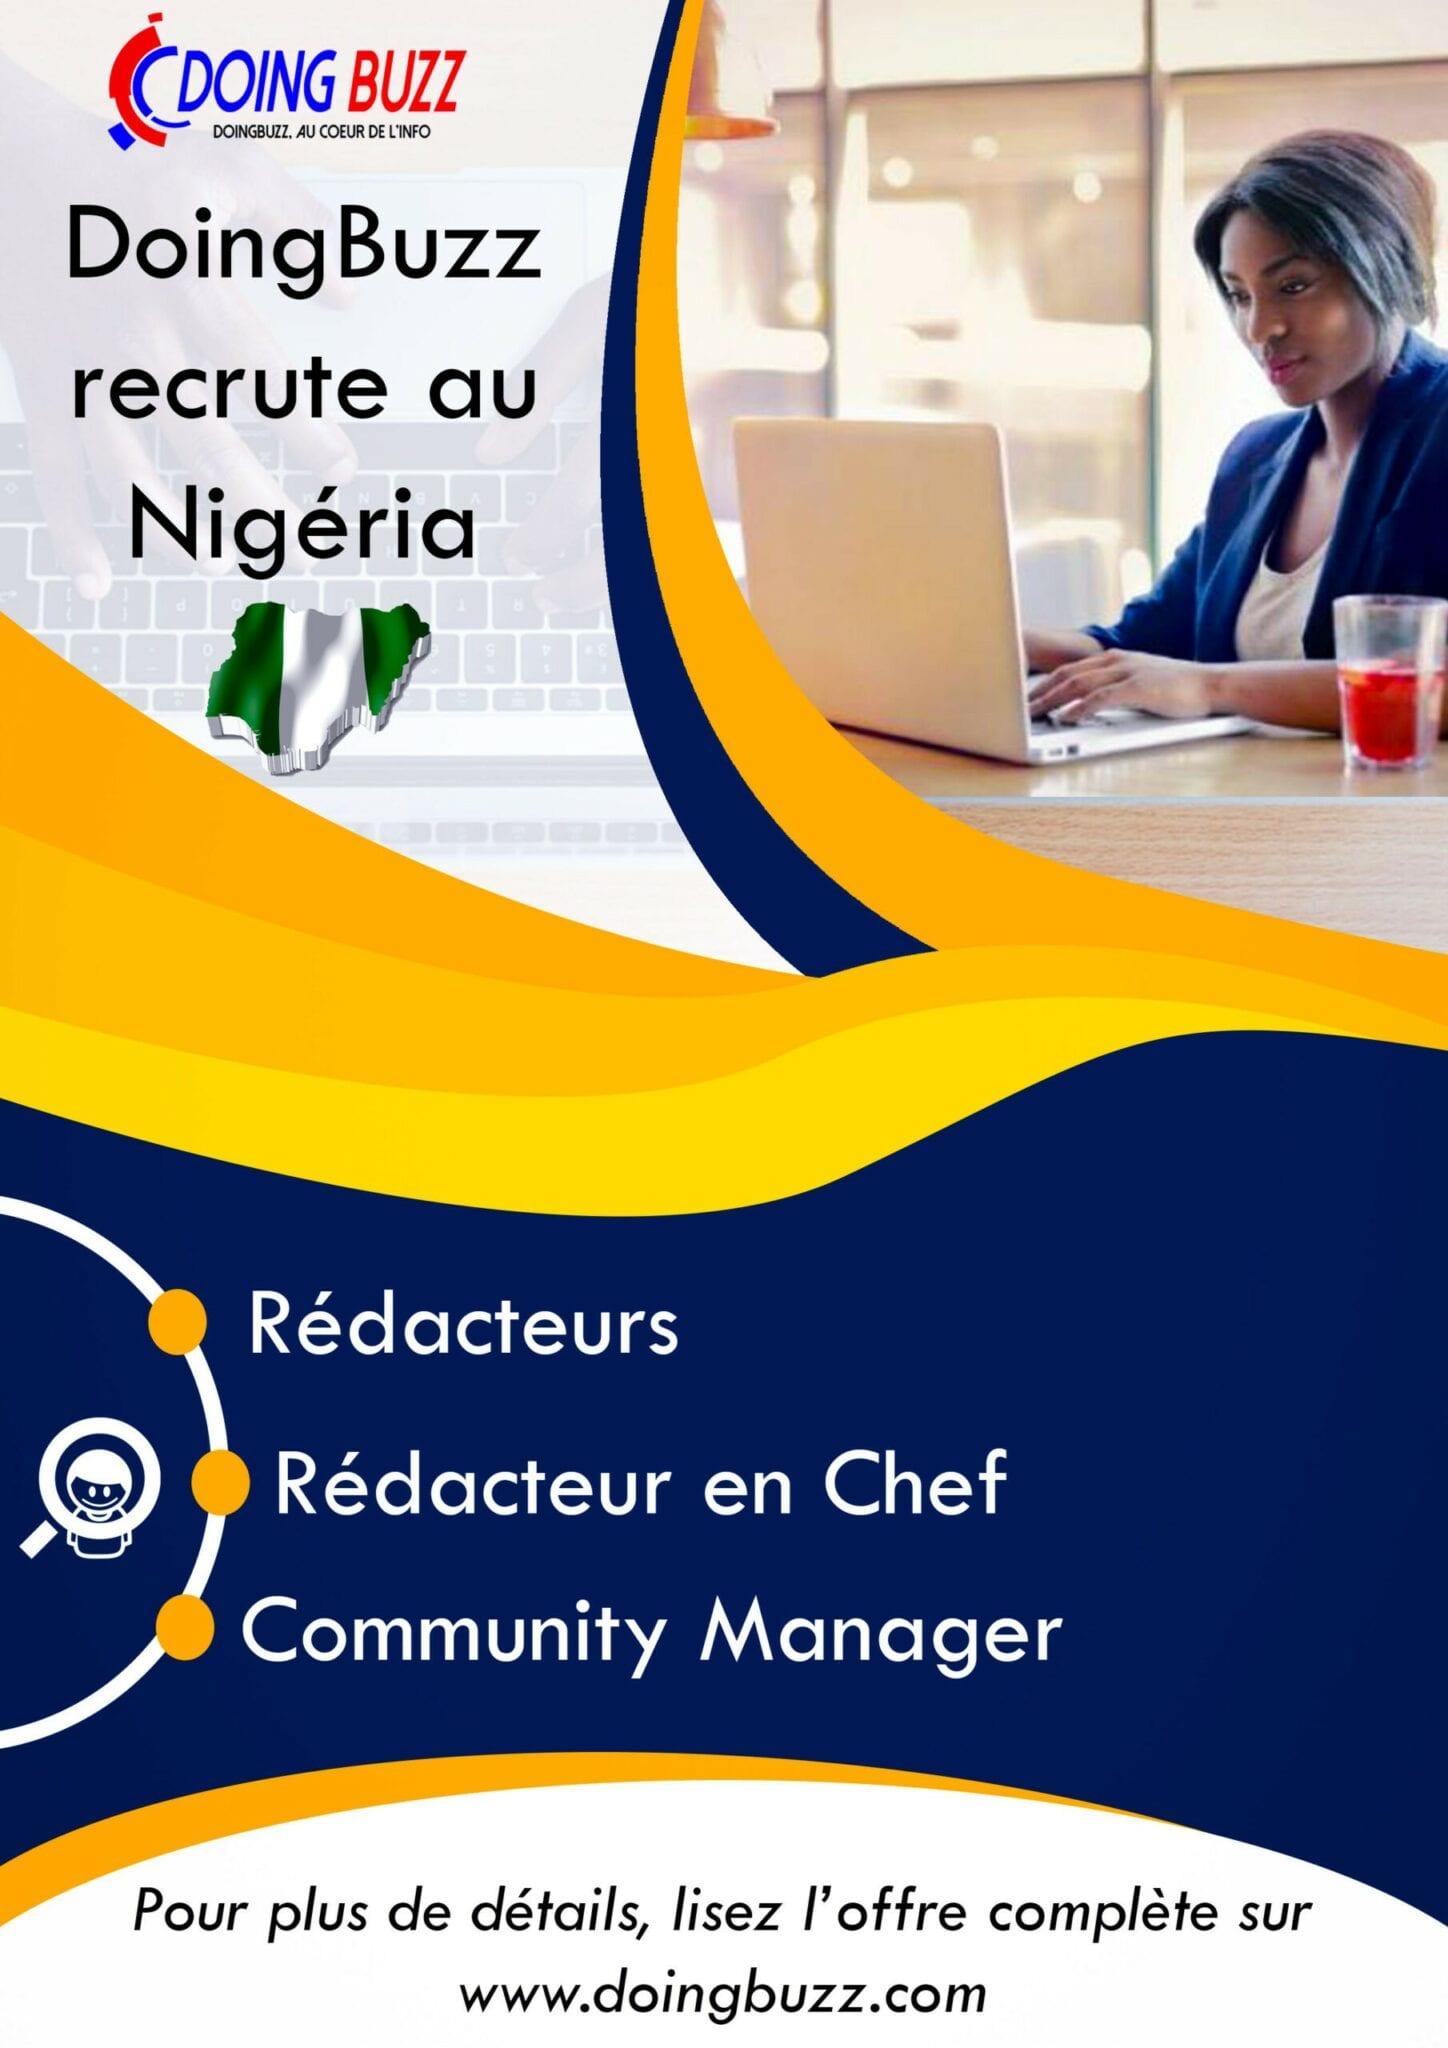 Doingbuzz.com recrute pour plusieurs postes au Nigéria